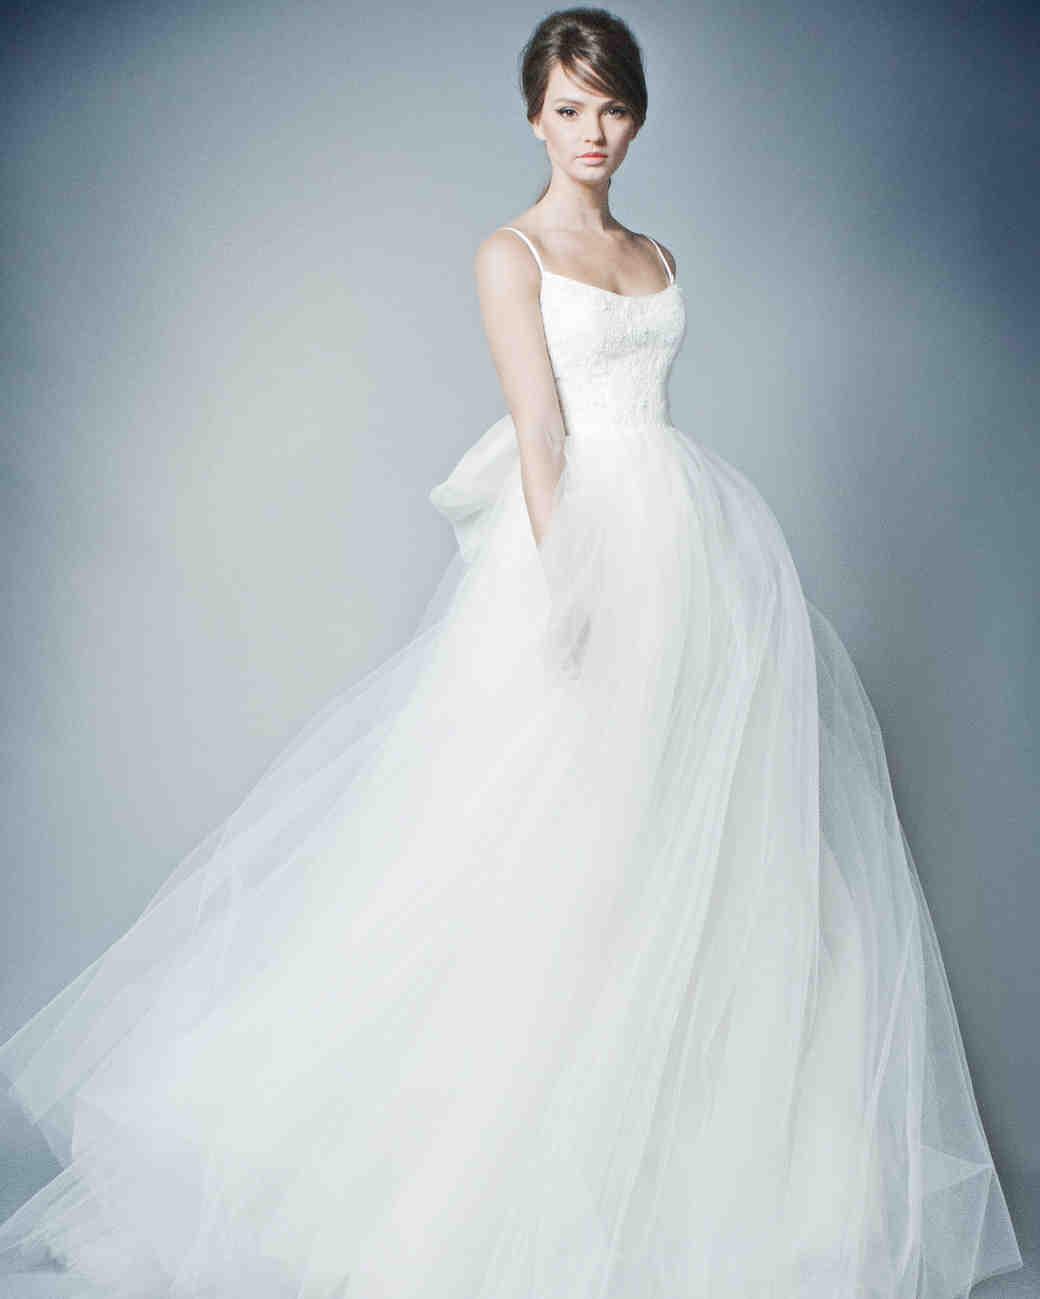 Romona New York Spring 2019 Wedding Dress Collection Martha Jolie Clothing Rhey Tulle Skirt Stewart Weddings